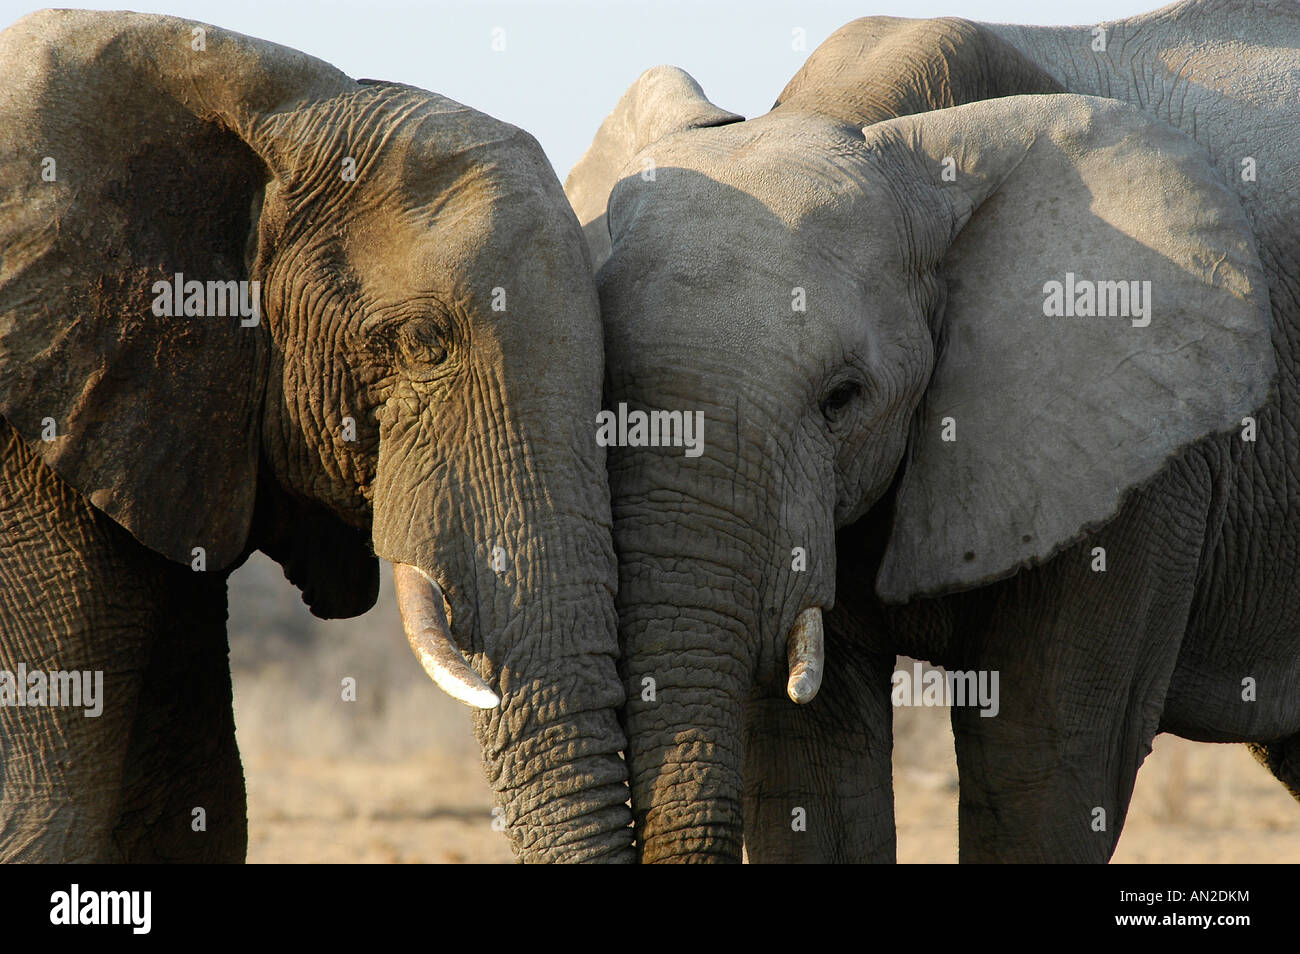 Afrikanische Elefanten african elephants Loxodonta africana - Stock Image